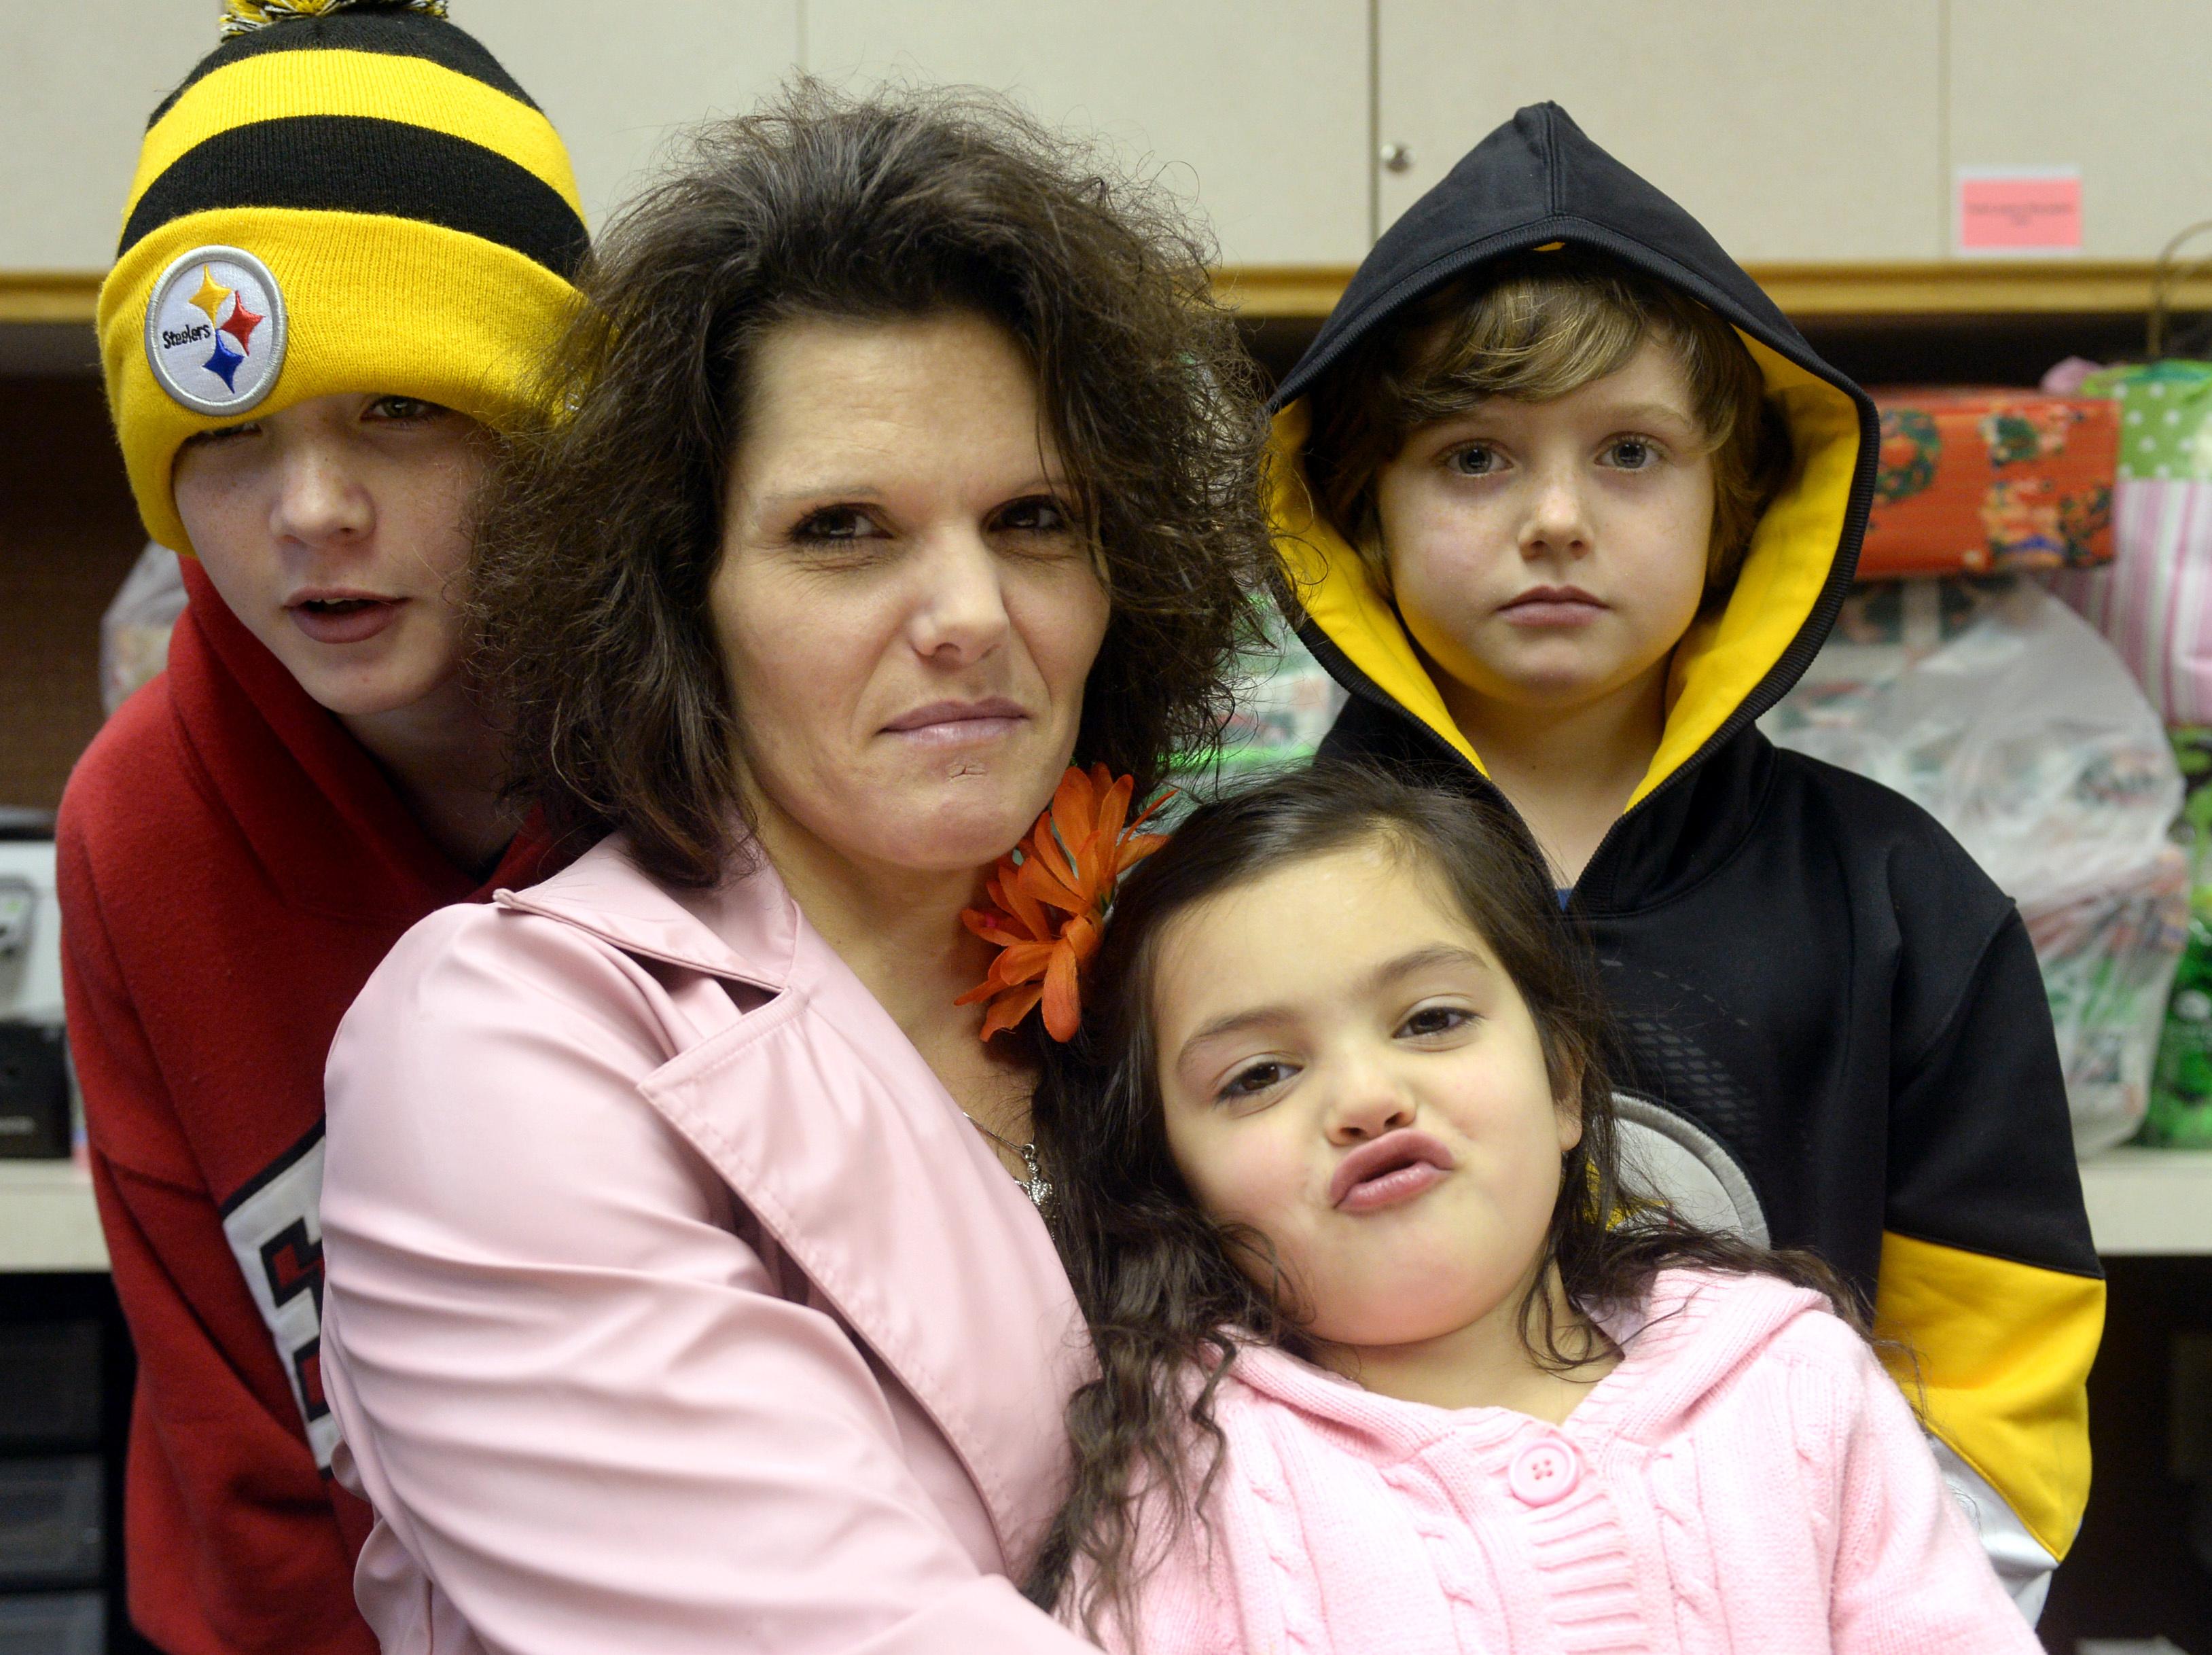 Christmas Bureau gives family reasons to smile | The Spokesman-Review